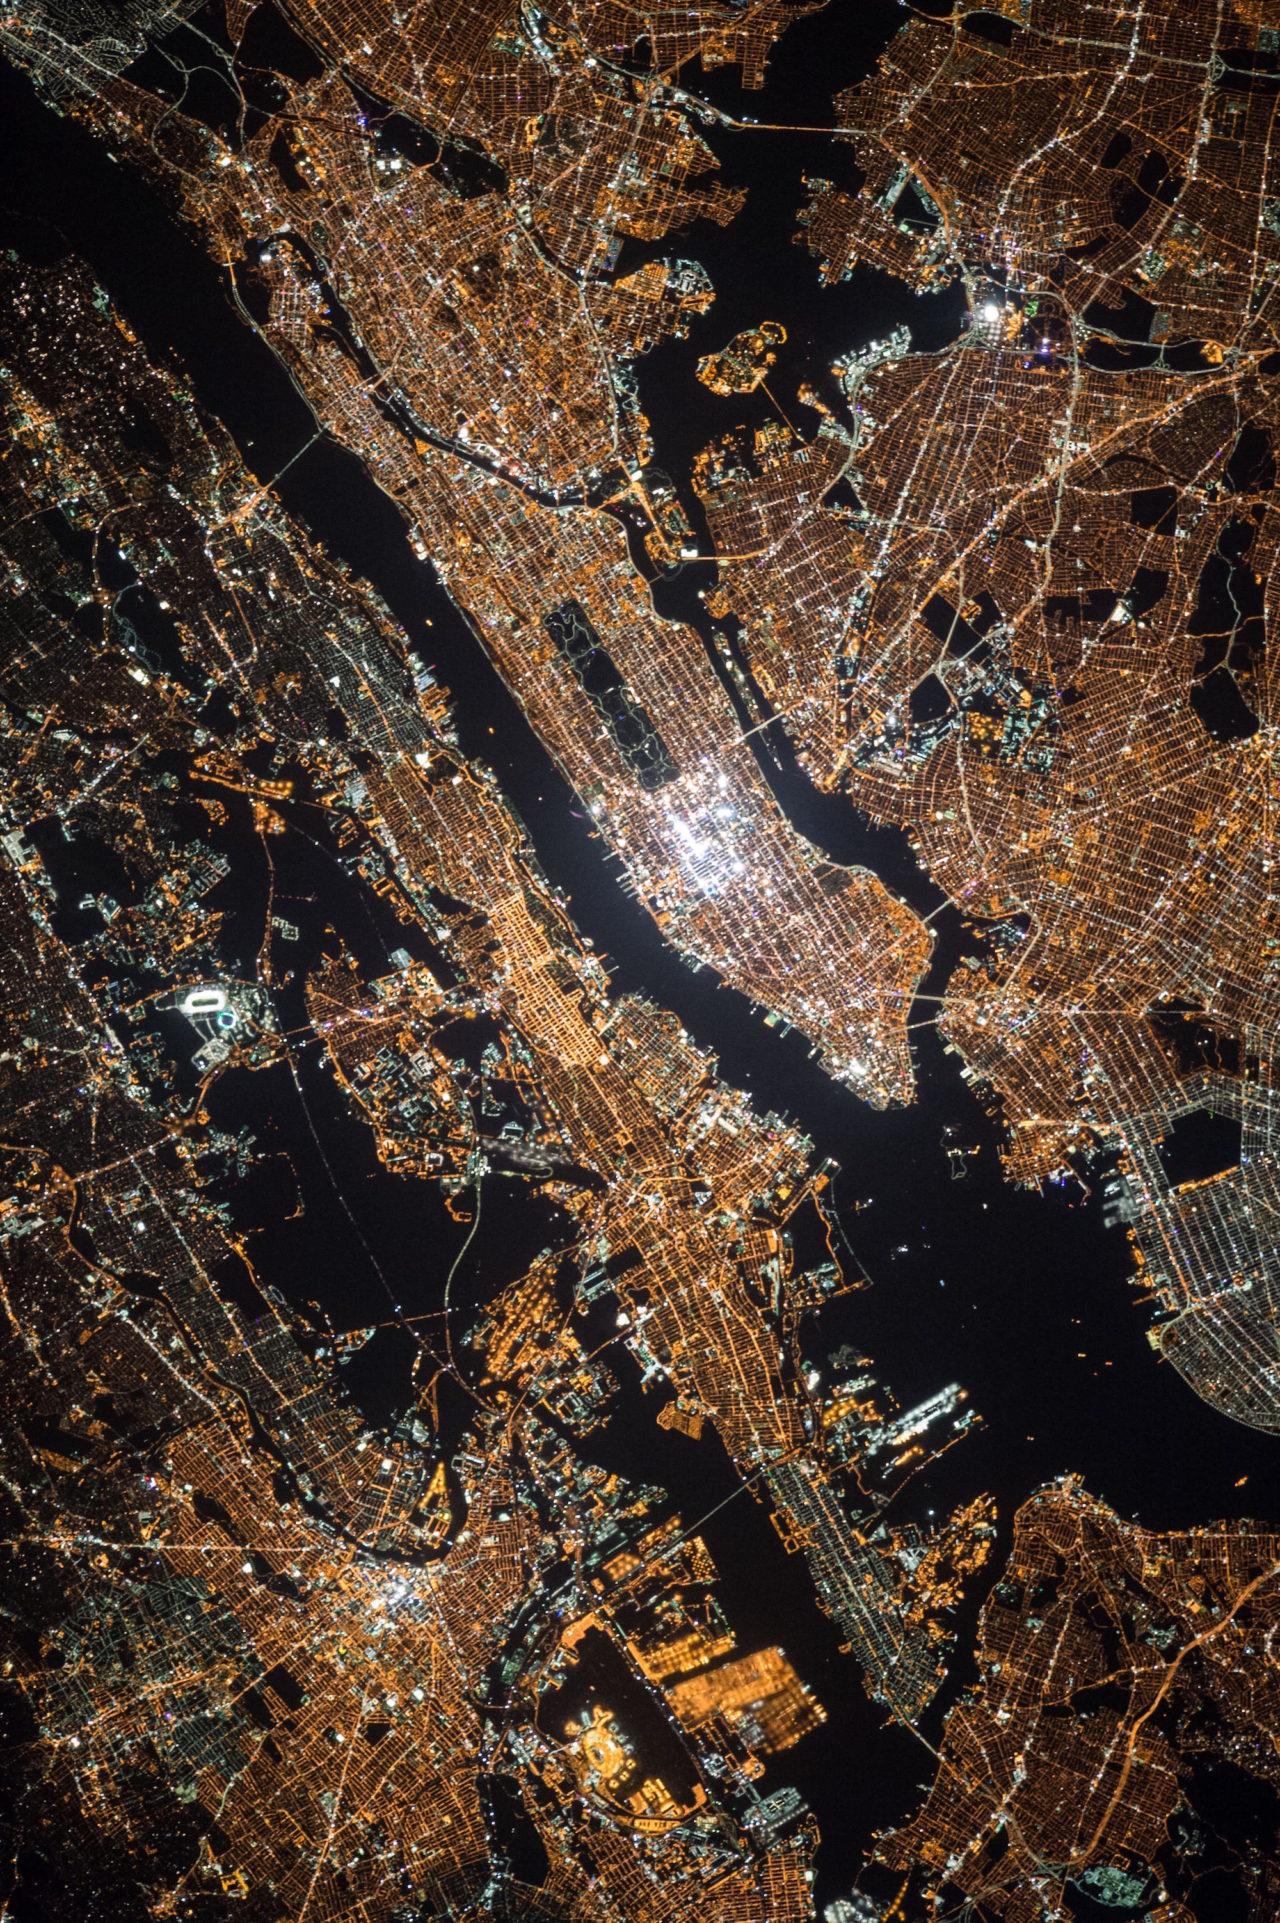 New York by night, by Nasa.